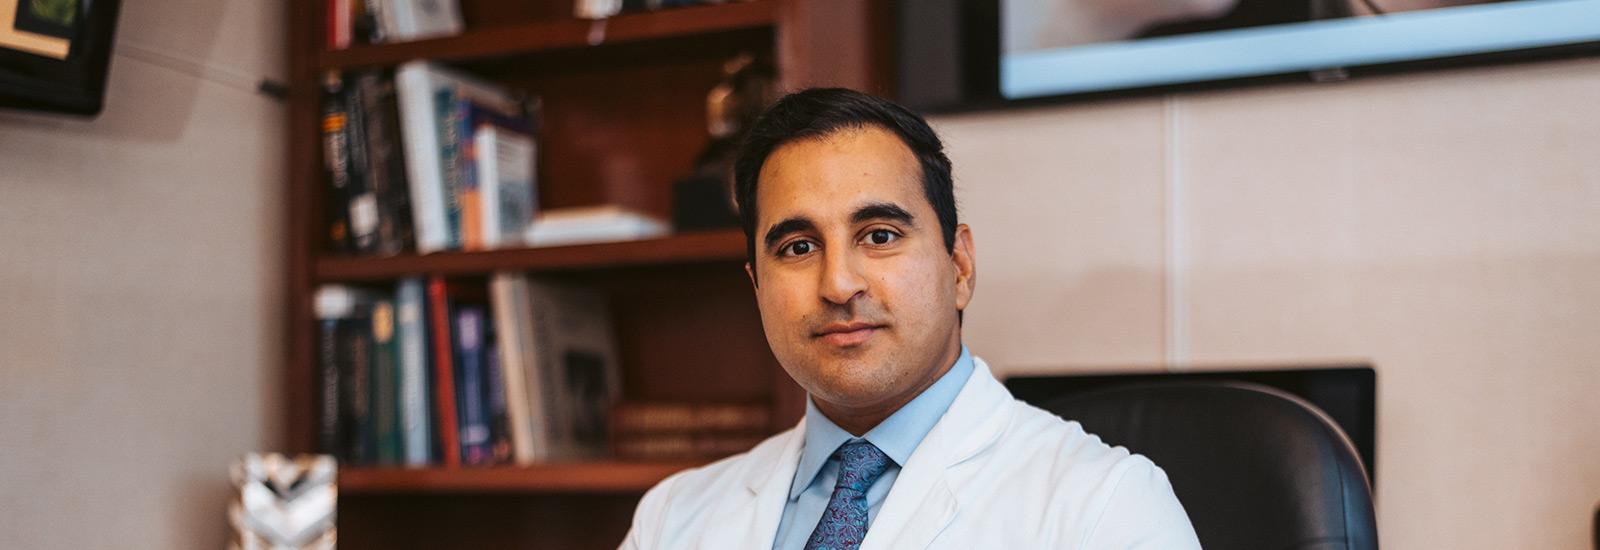 the best plastic surgeon in california, Dr Deepak Dugar